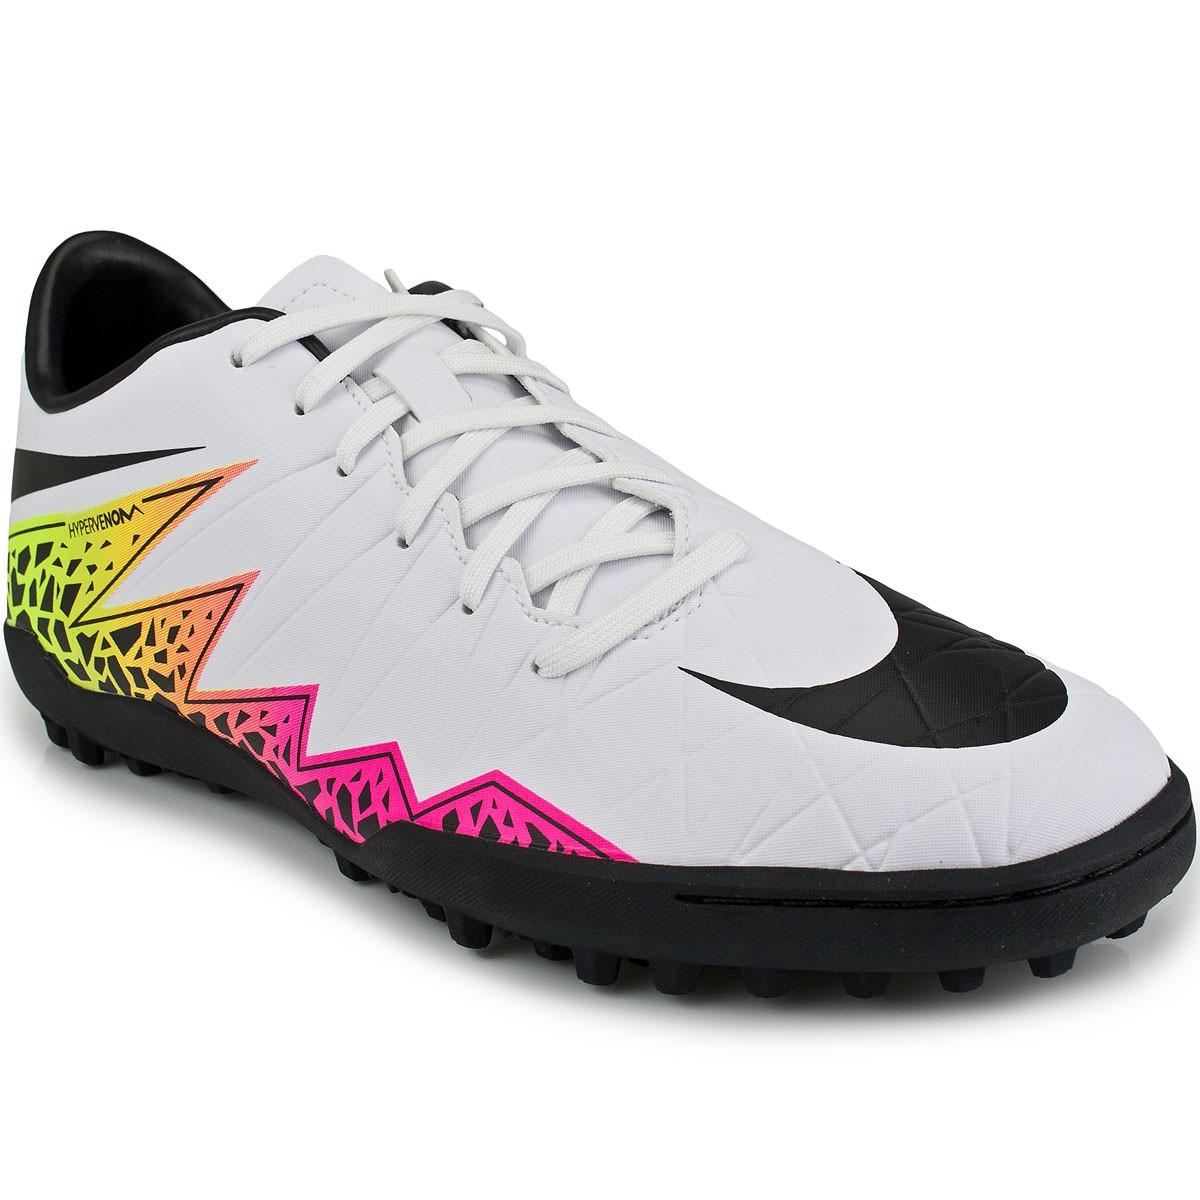 2652356c87 Chuteira Nike Hypervenom Phelon II TF 749899